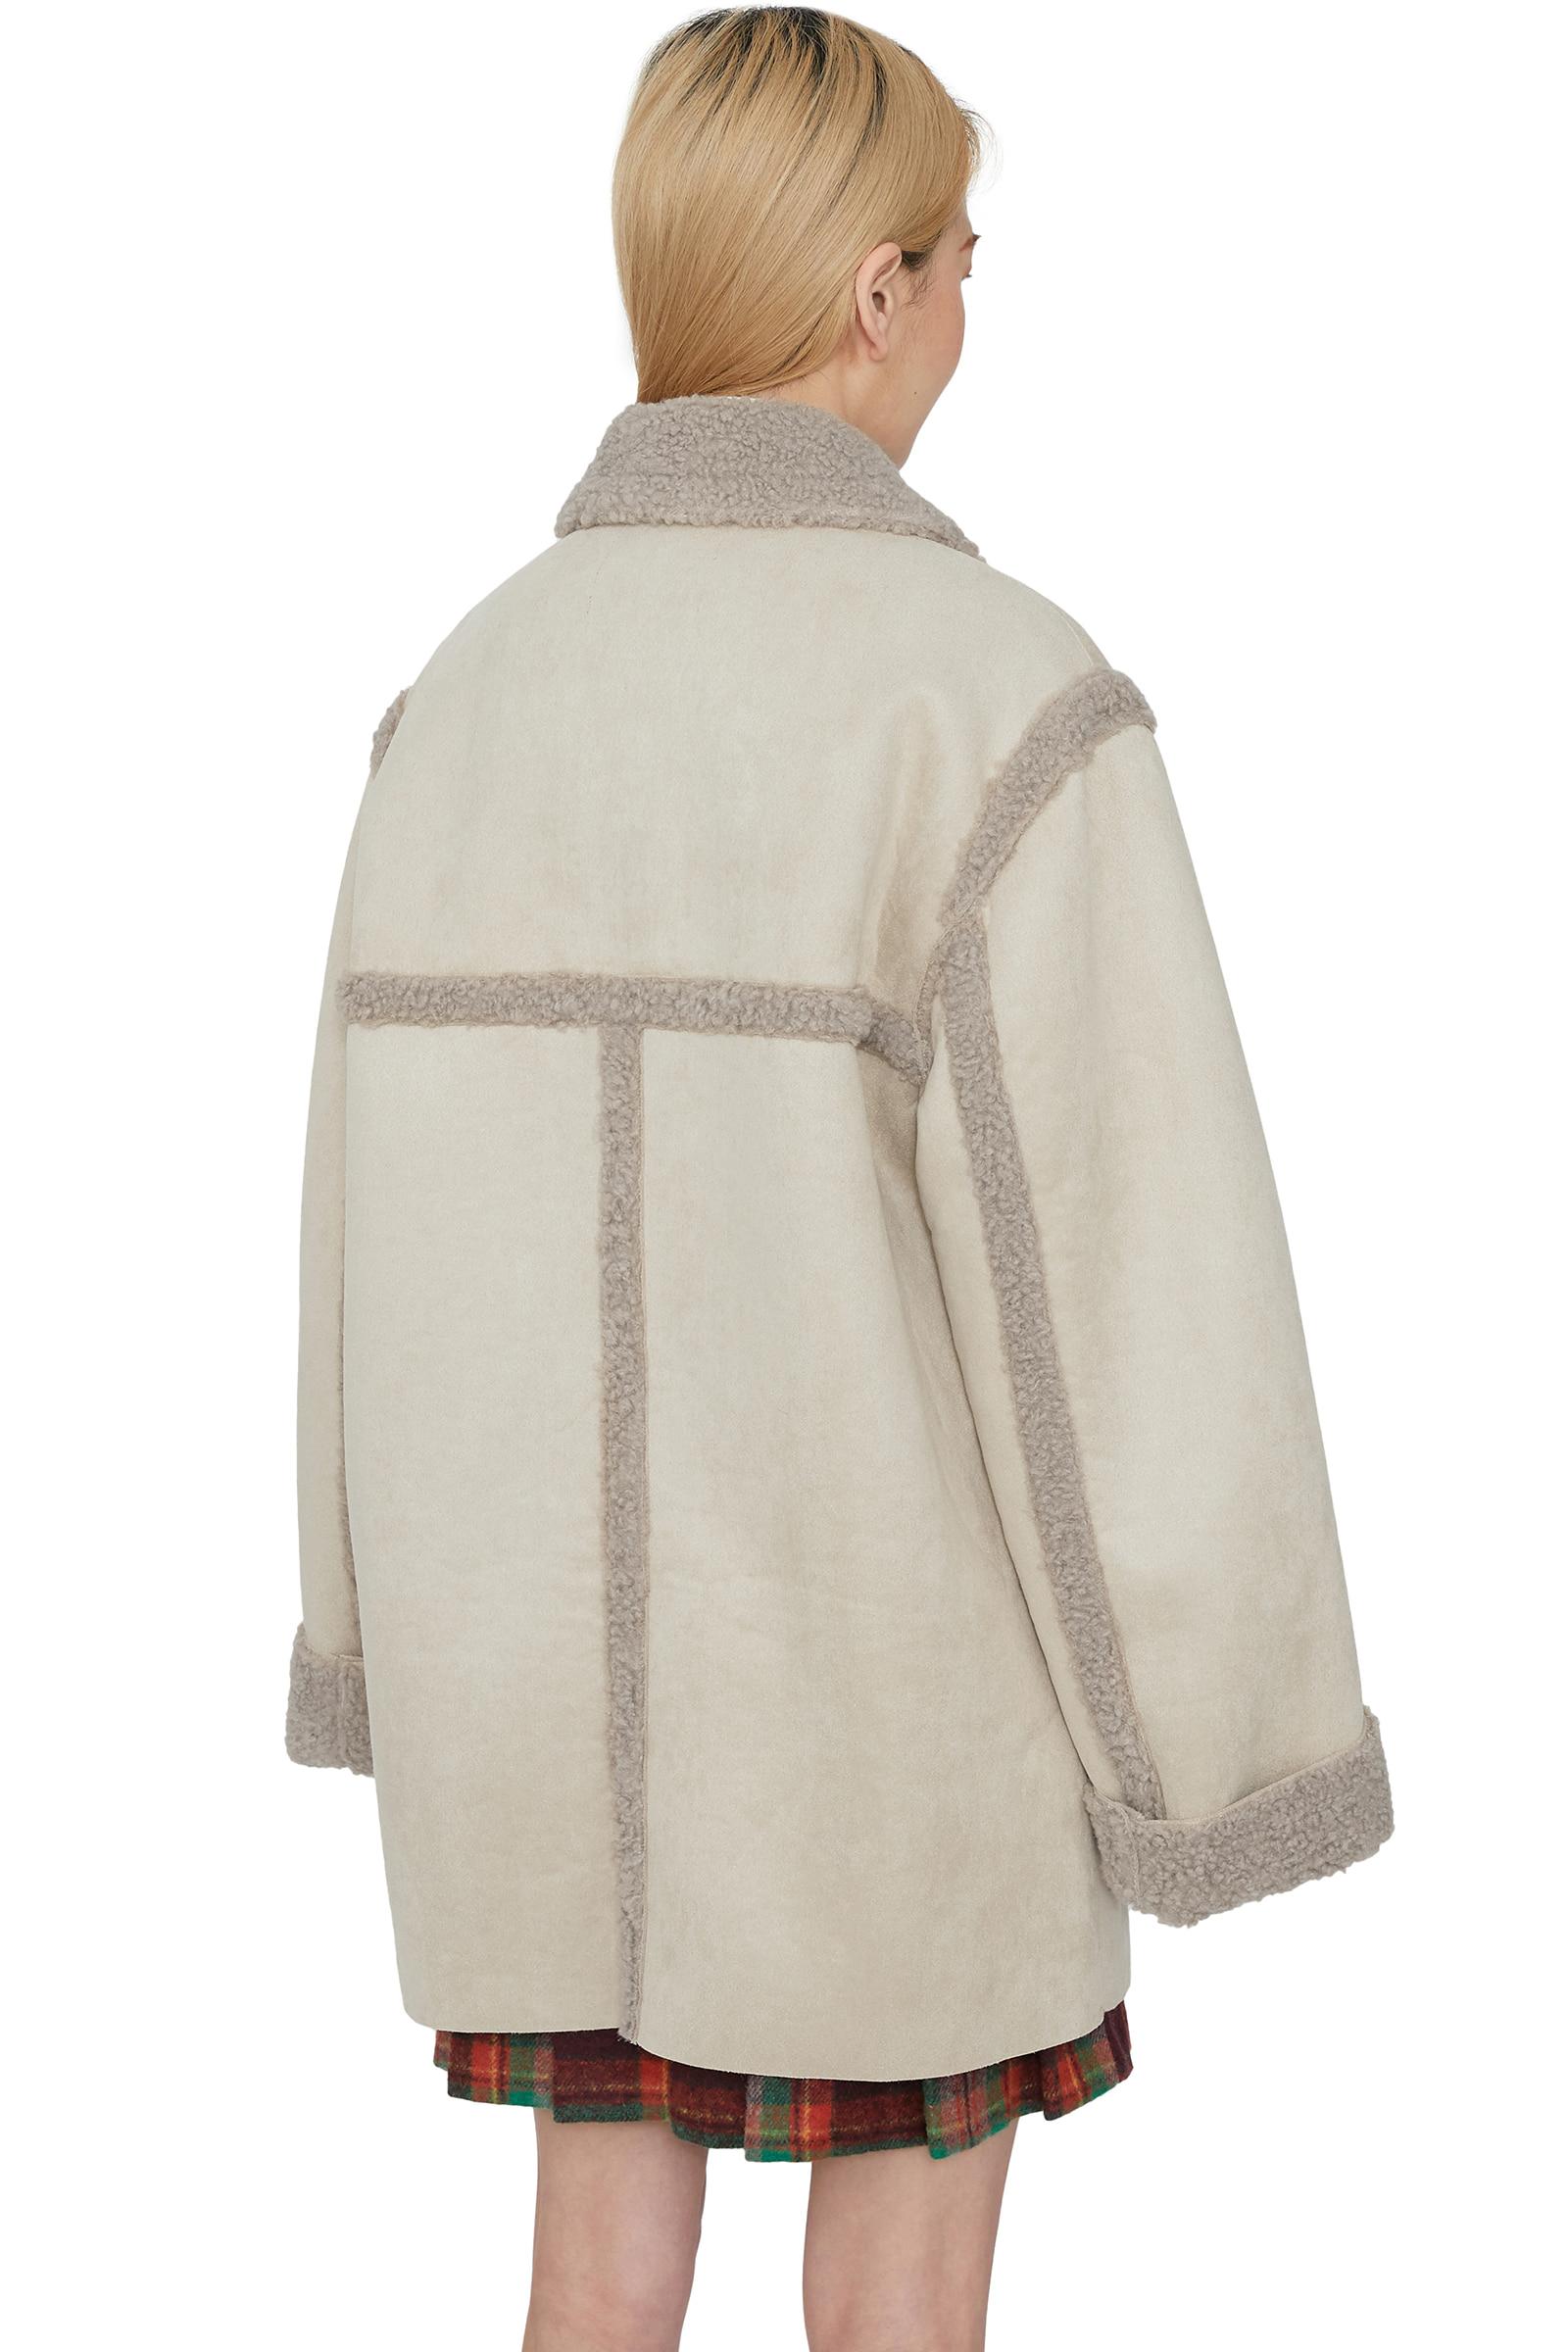 Alex shearling mustang coat